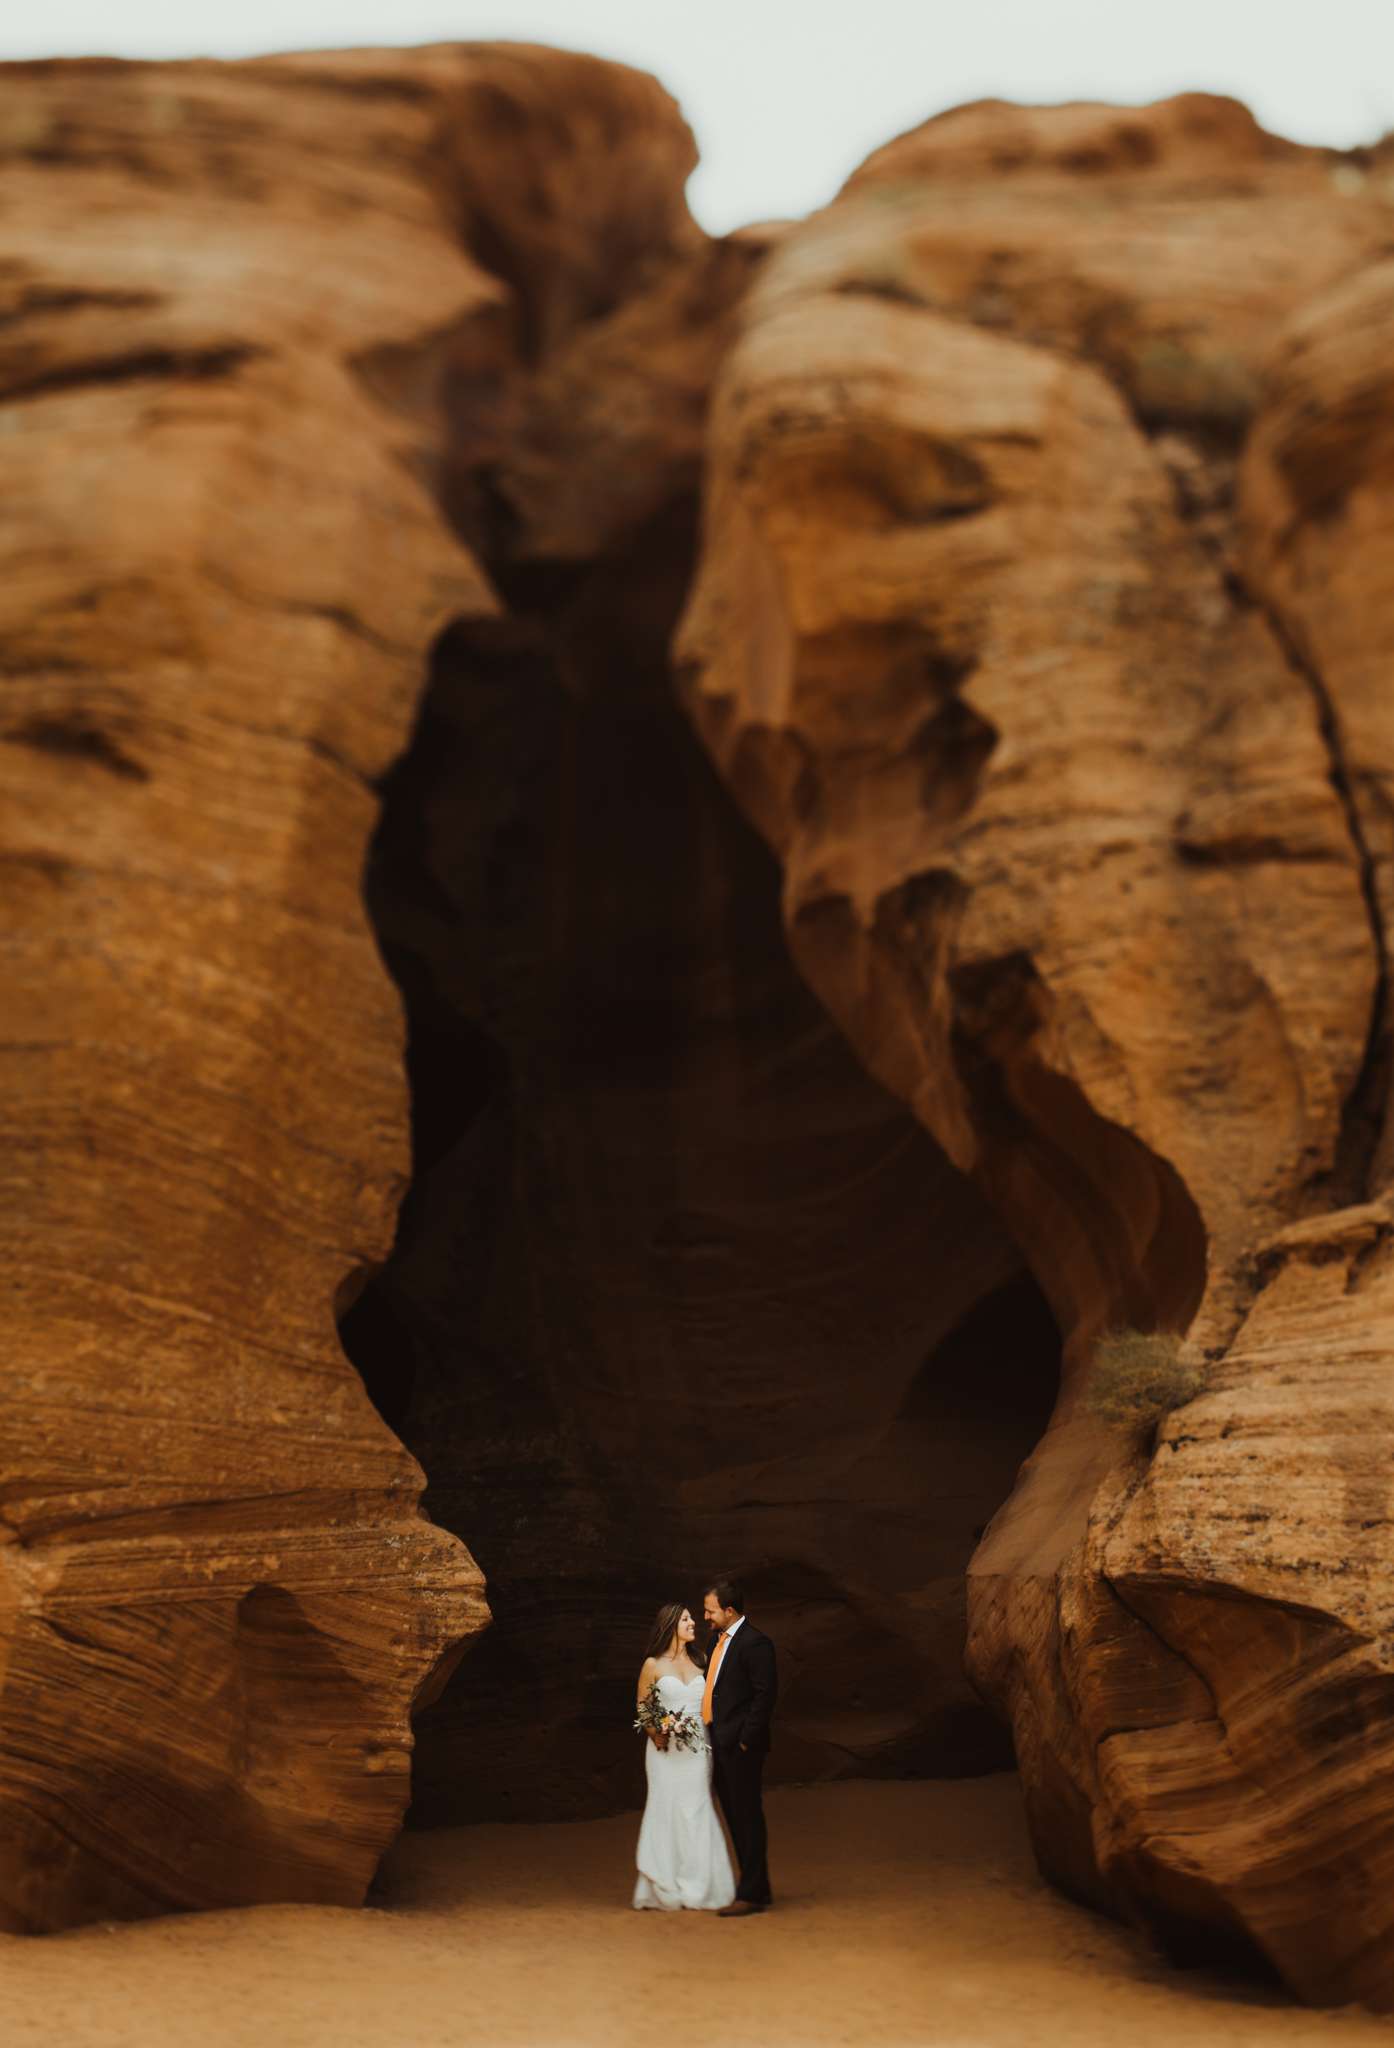 ©Isaiah + Taylor Photography - Lake Powell Elopement & Antelope Canyon & Horseshoe Bend, Page, Arizona-63.jpg